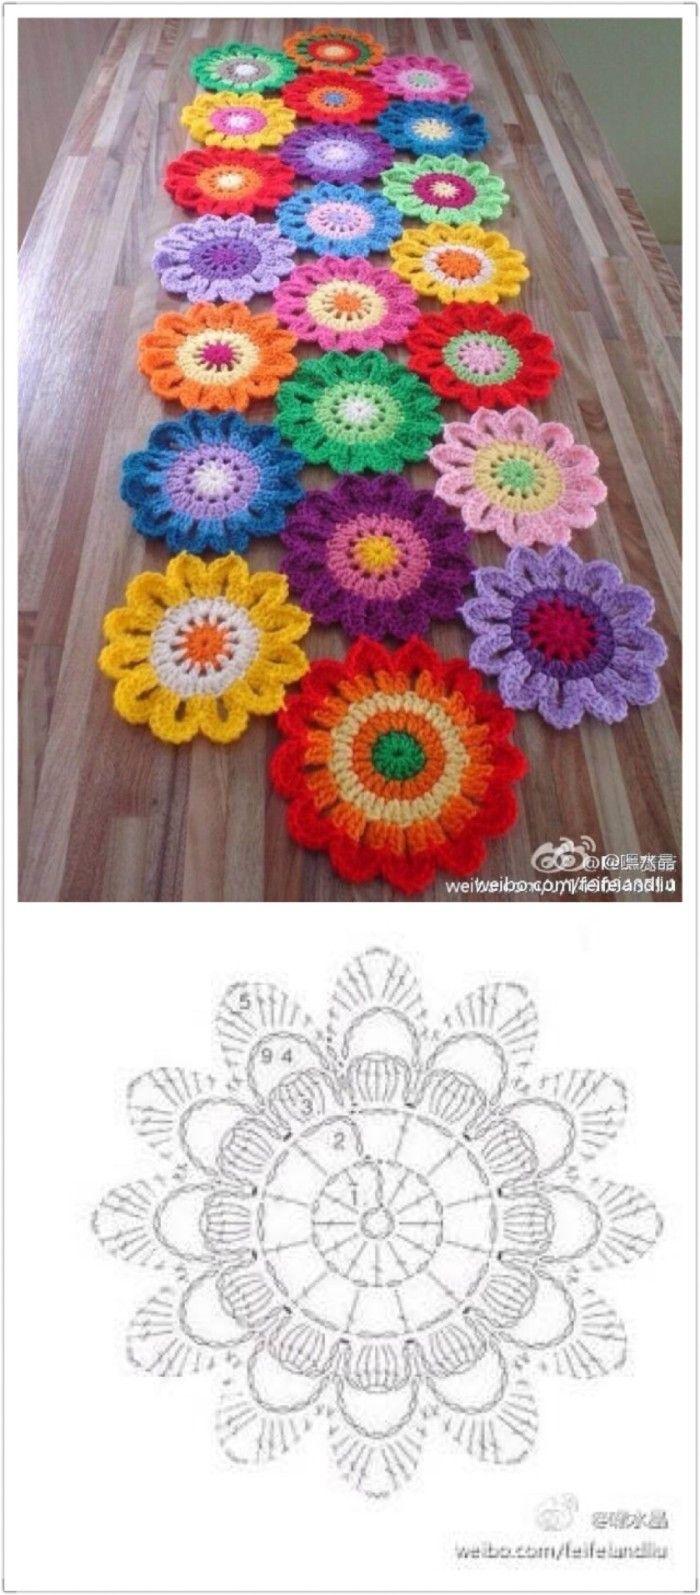 Flower blanket   Crafts   Pinterest   Ganchillo, Tejido y Flores tejidas